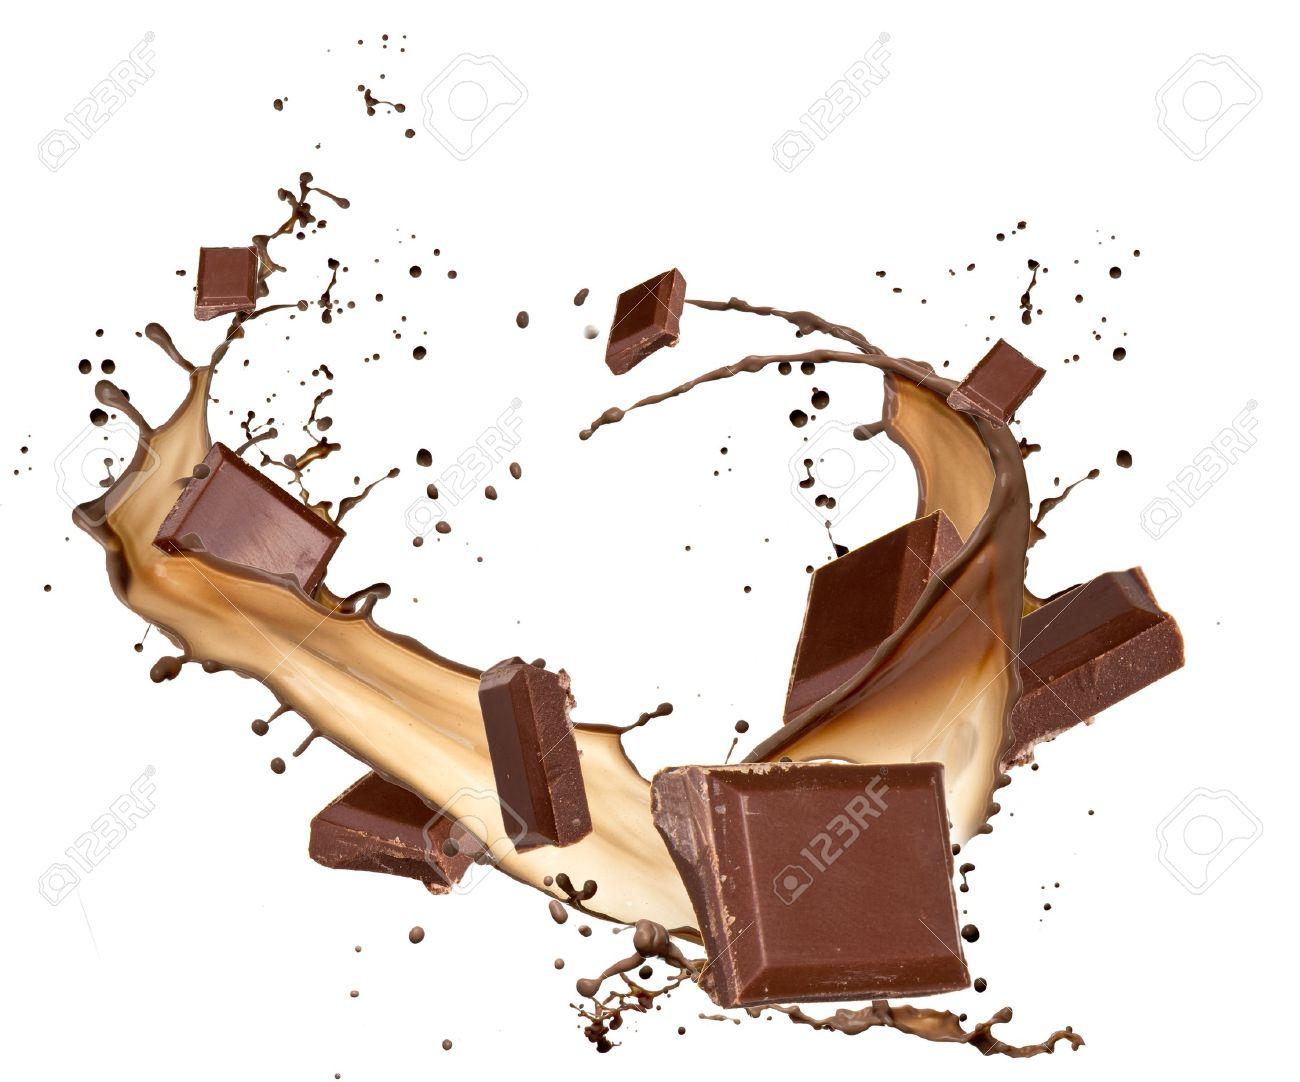 Chocolate bars in chocolate splash, isolated on white background Stock Photo - 12574237